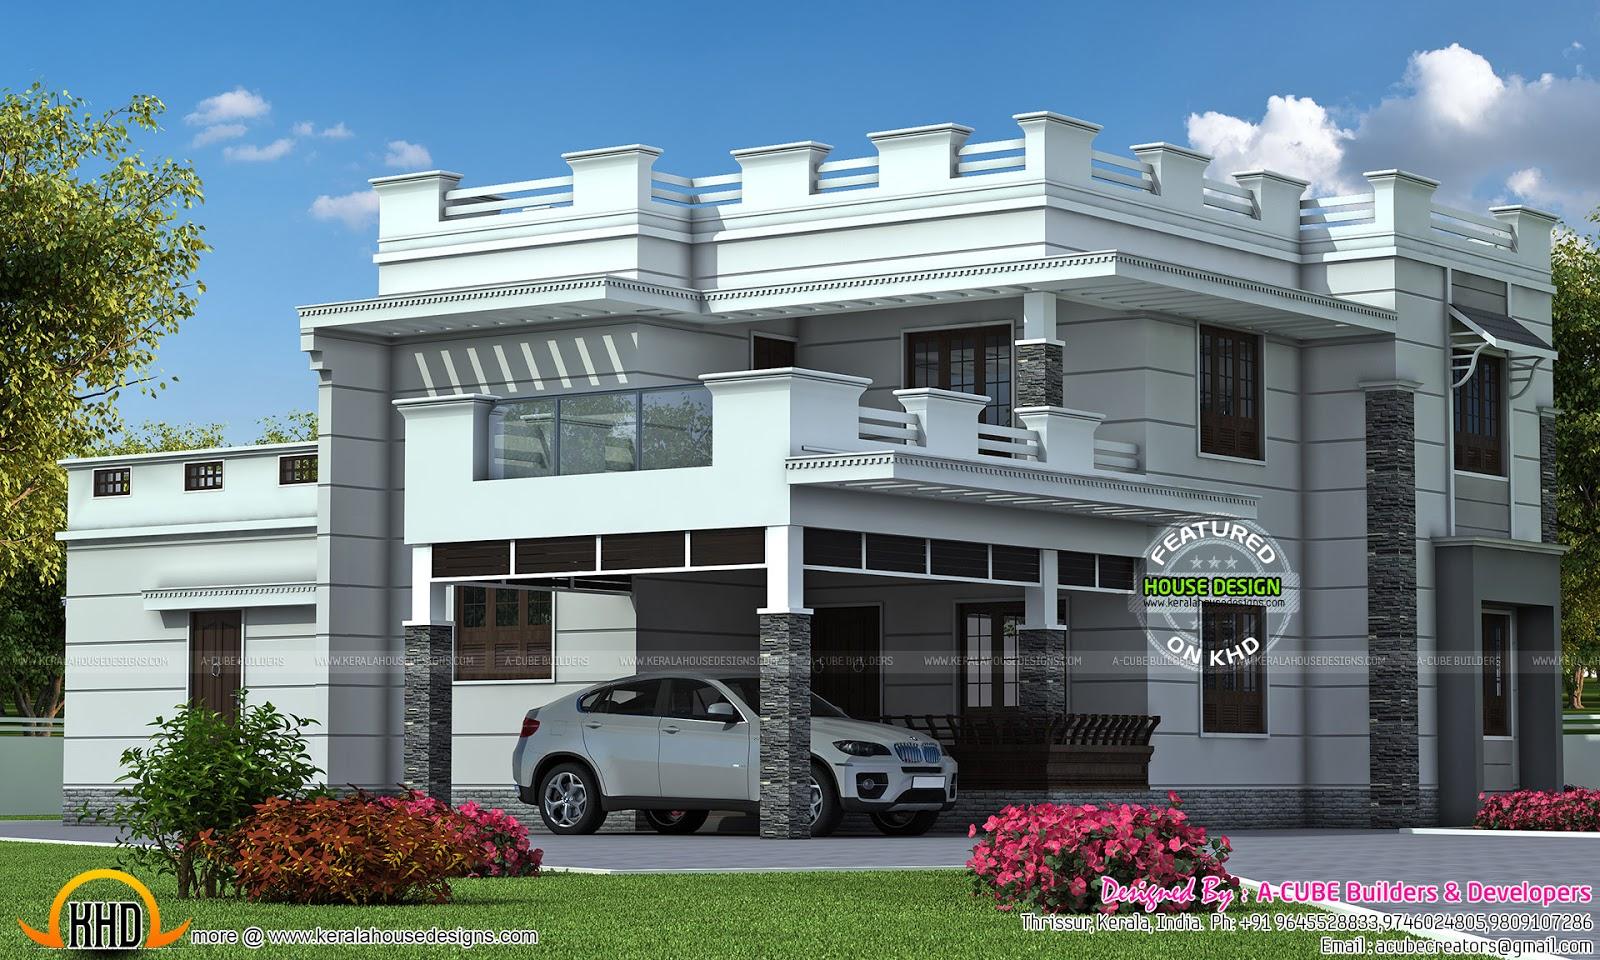 Decorative Flat Roof : Decorative flat roof home kerala design and floor plans